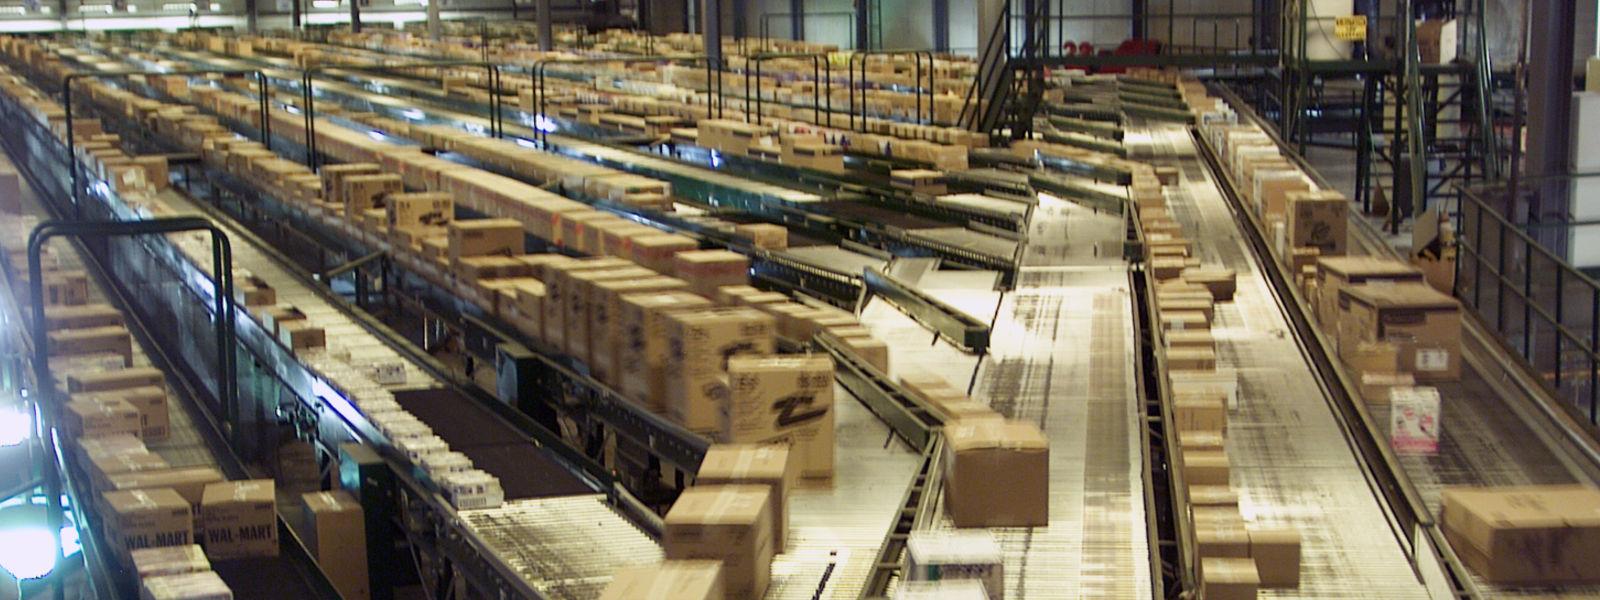 Hytrol Distribution Conveyors